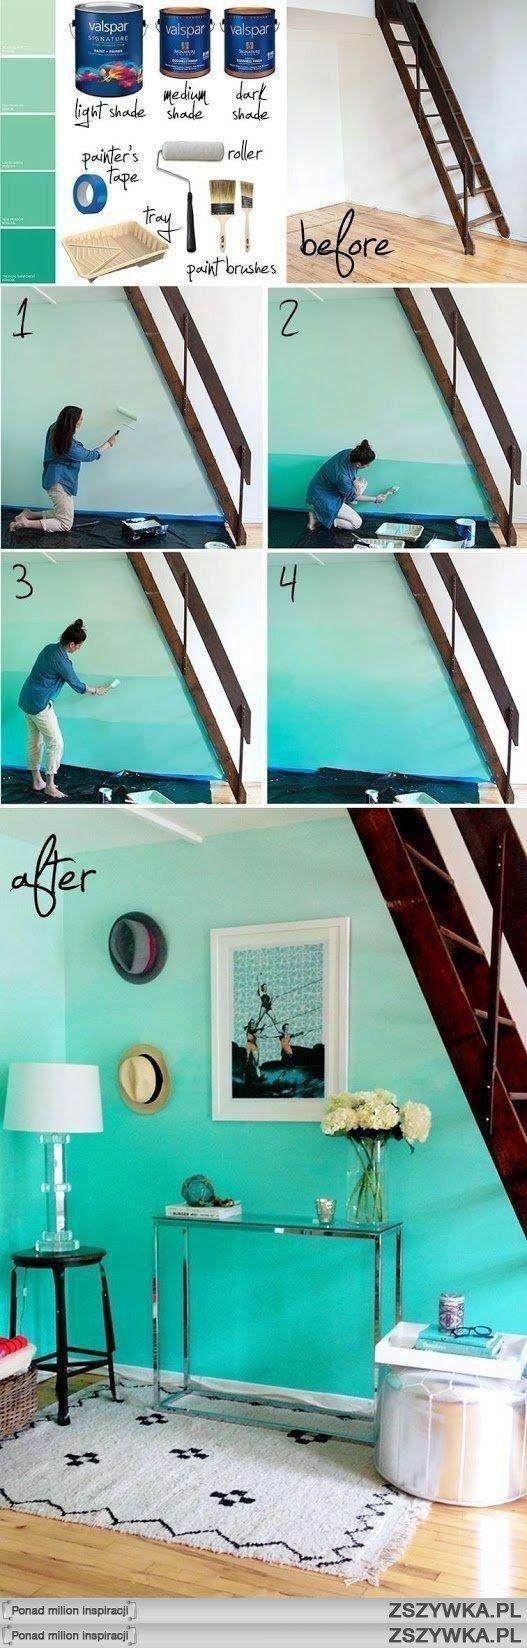 interessante Wandfarbe #Streichen #Wand #Farbe #ombre #Wandfarbe #DIY